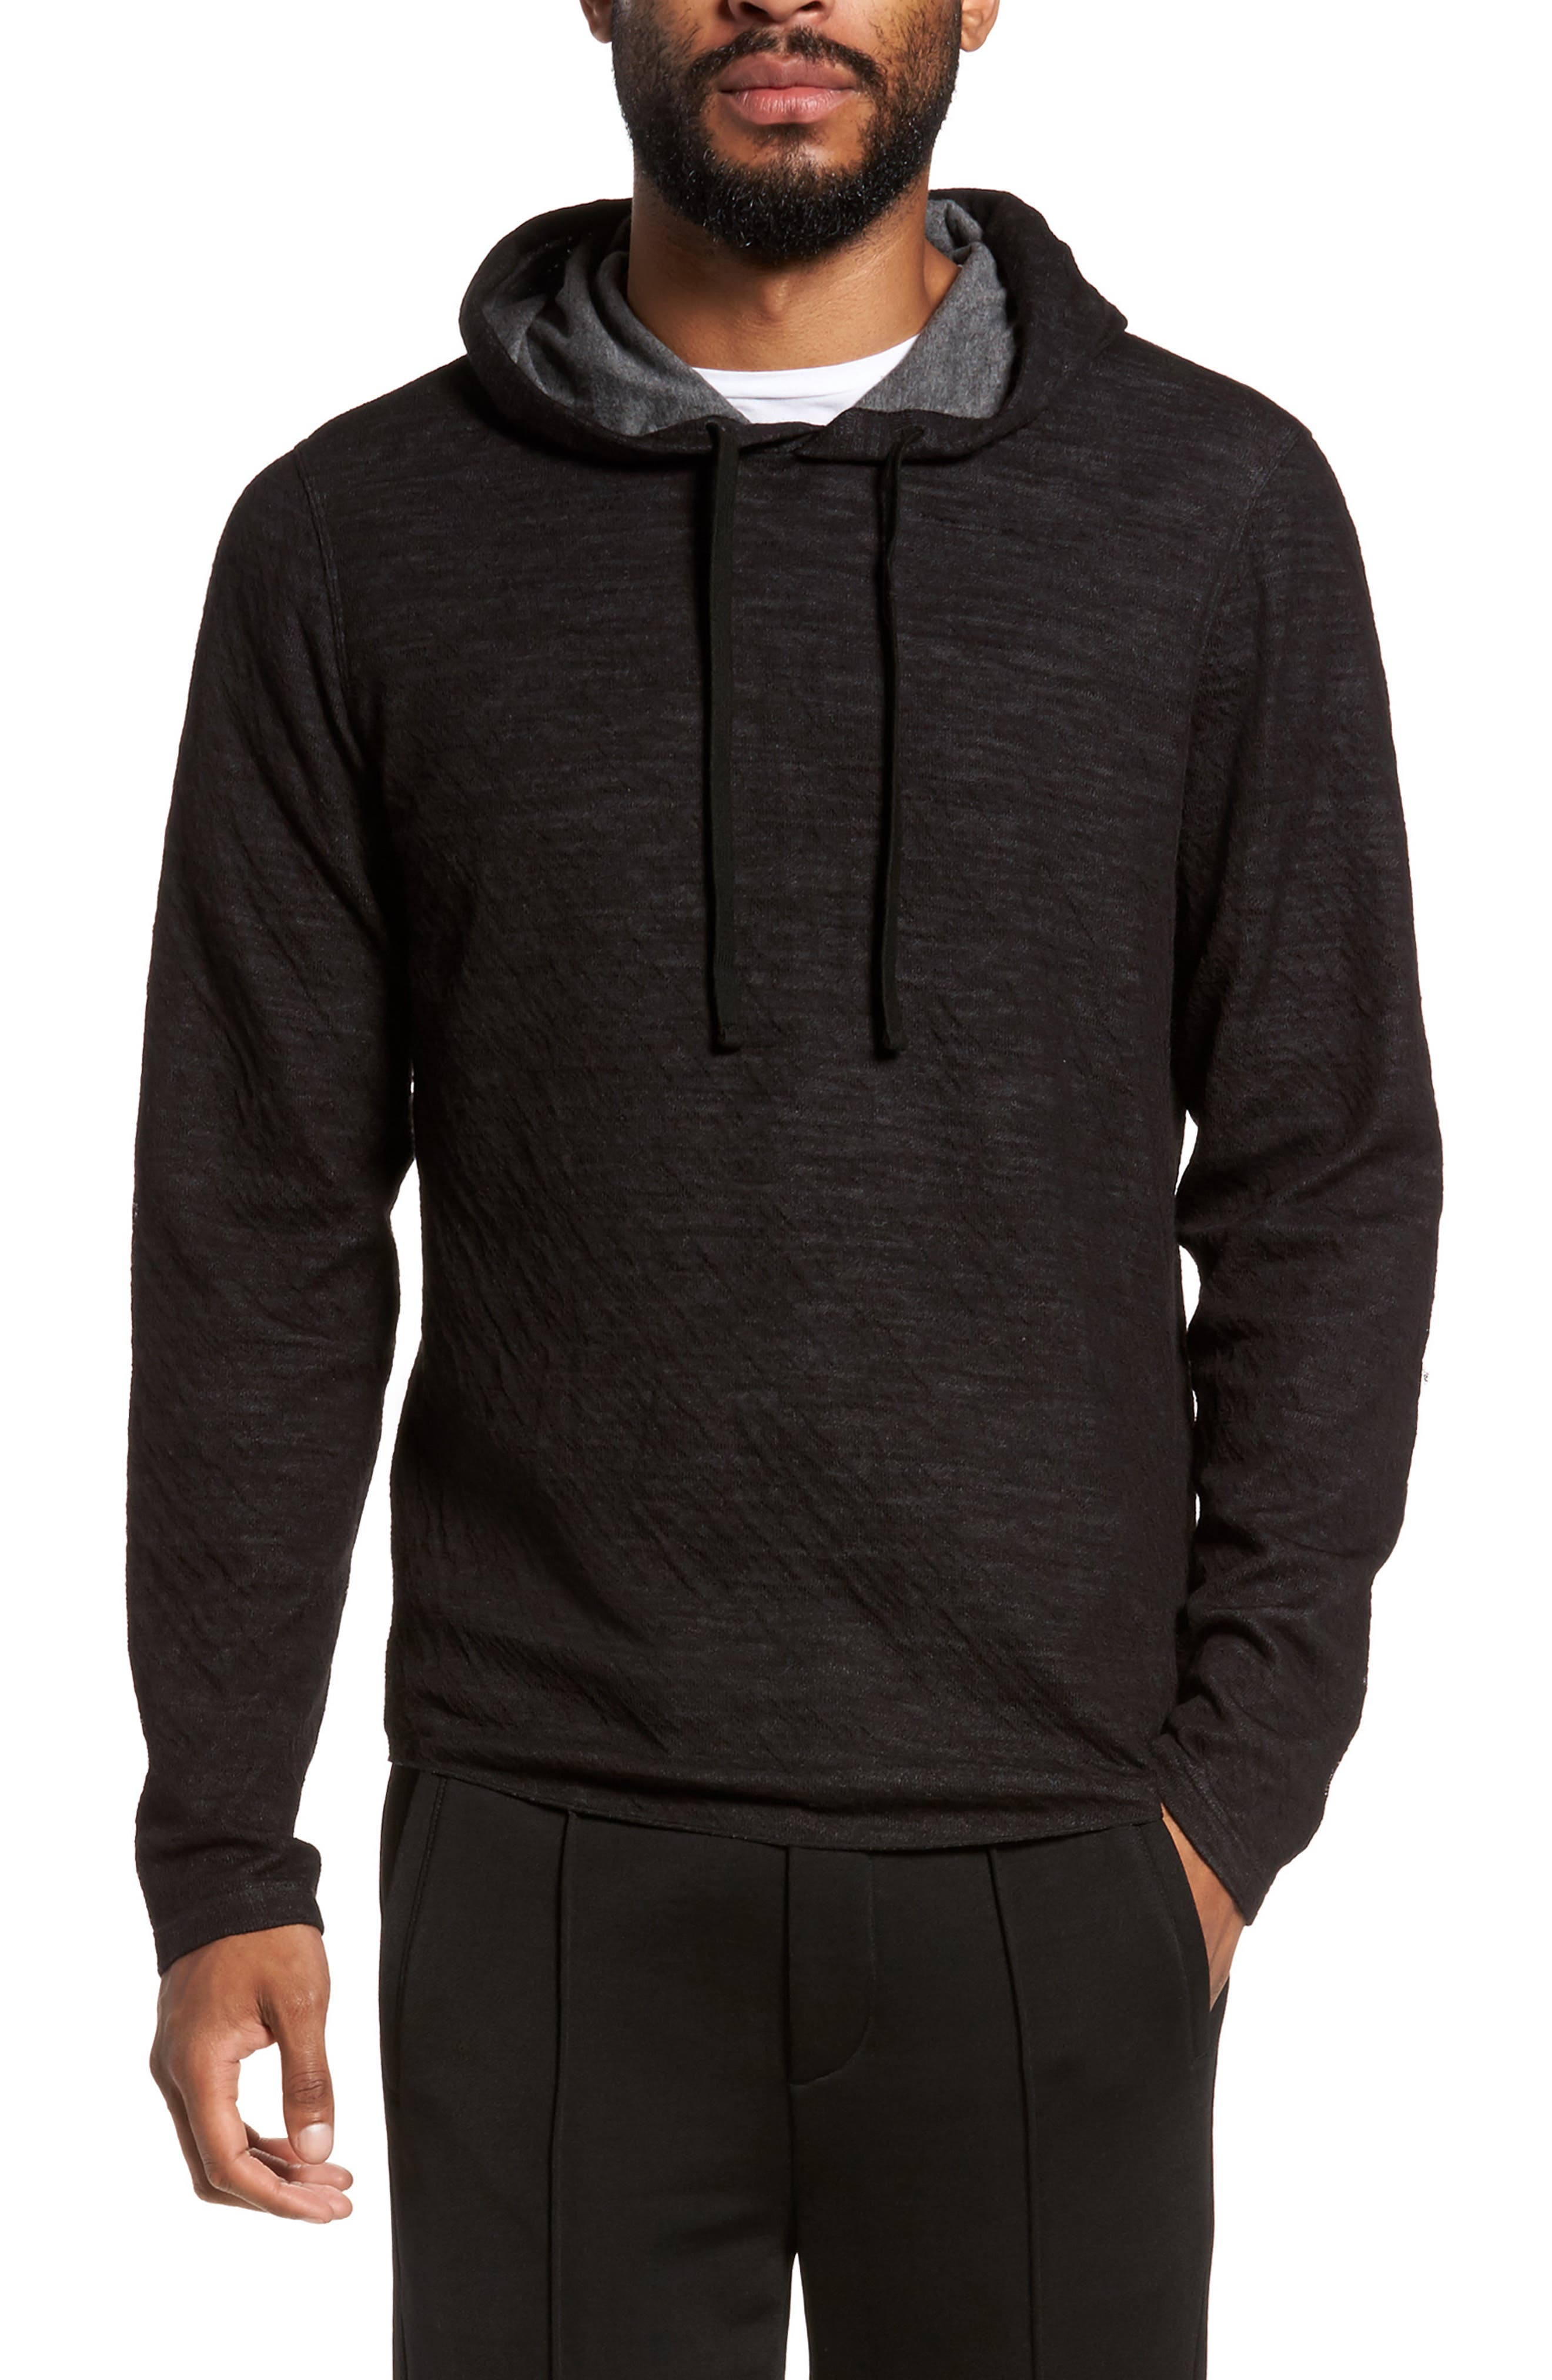 Contrast Double Knit Cotton & Wool Hoodie,                             Main thumbnail 1, color,                             Black/ H Carbon